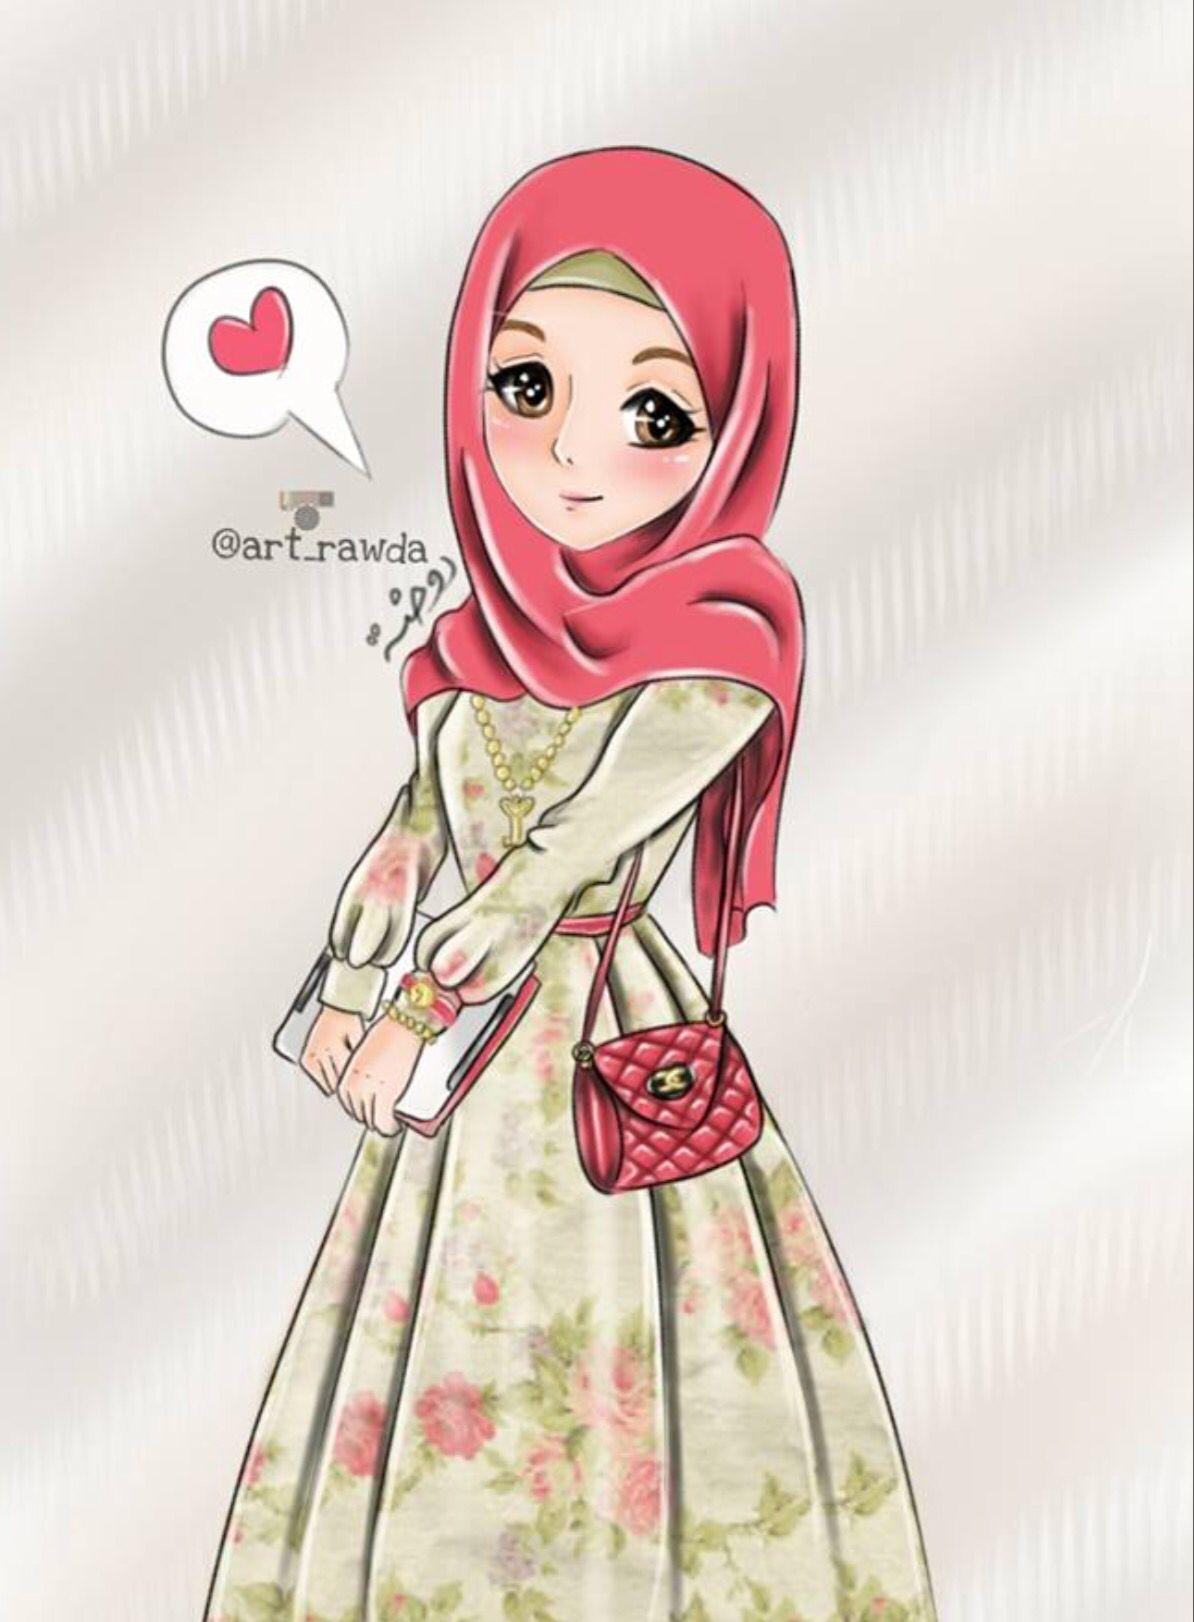 Resultat De Recherche D Images Pour Facebook Art Rawda Animasi Kartun Gambar